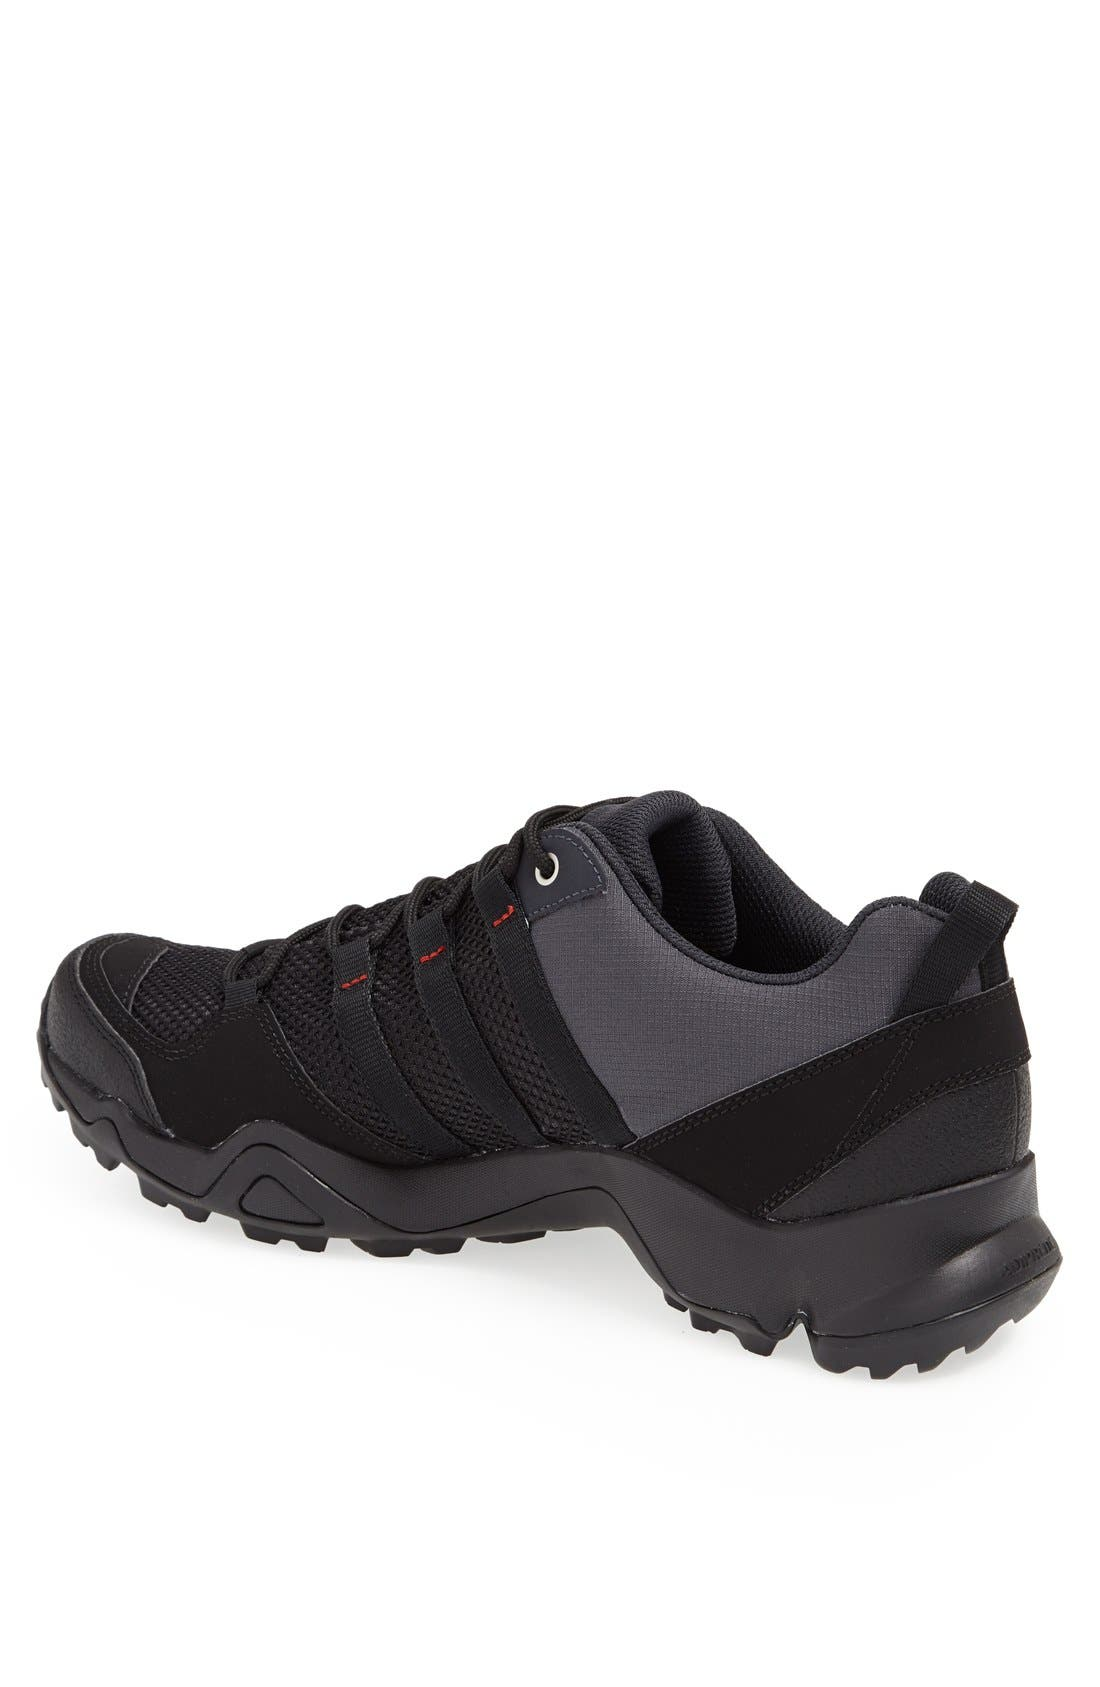 'AX2' Hiking Shoe,                             Alternate thumbnail 2, color,                             022